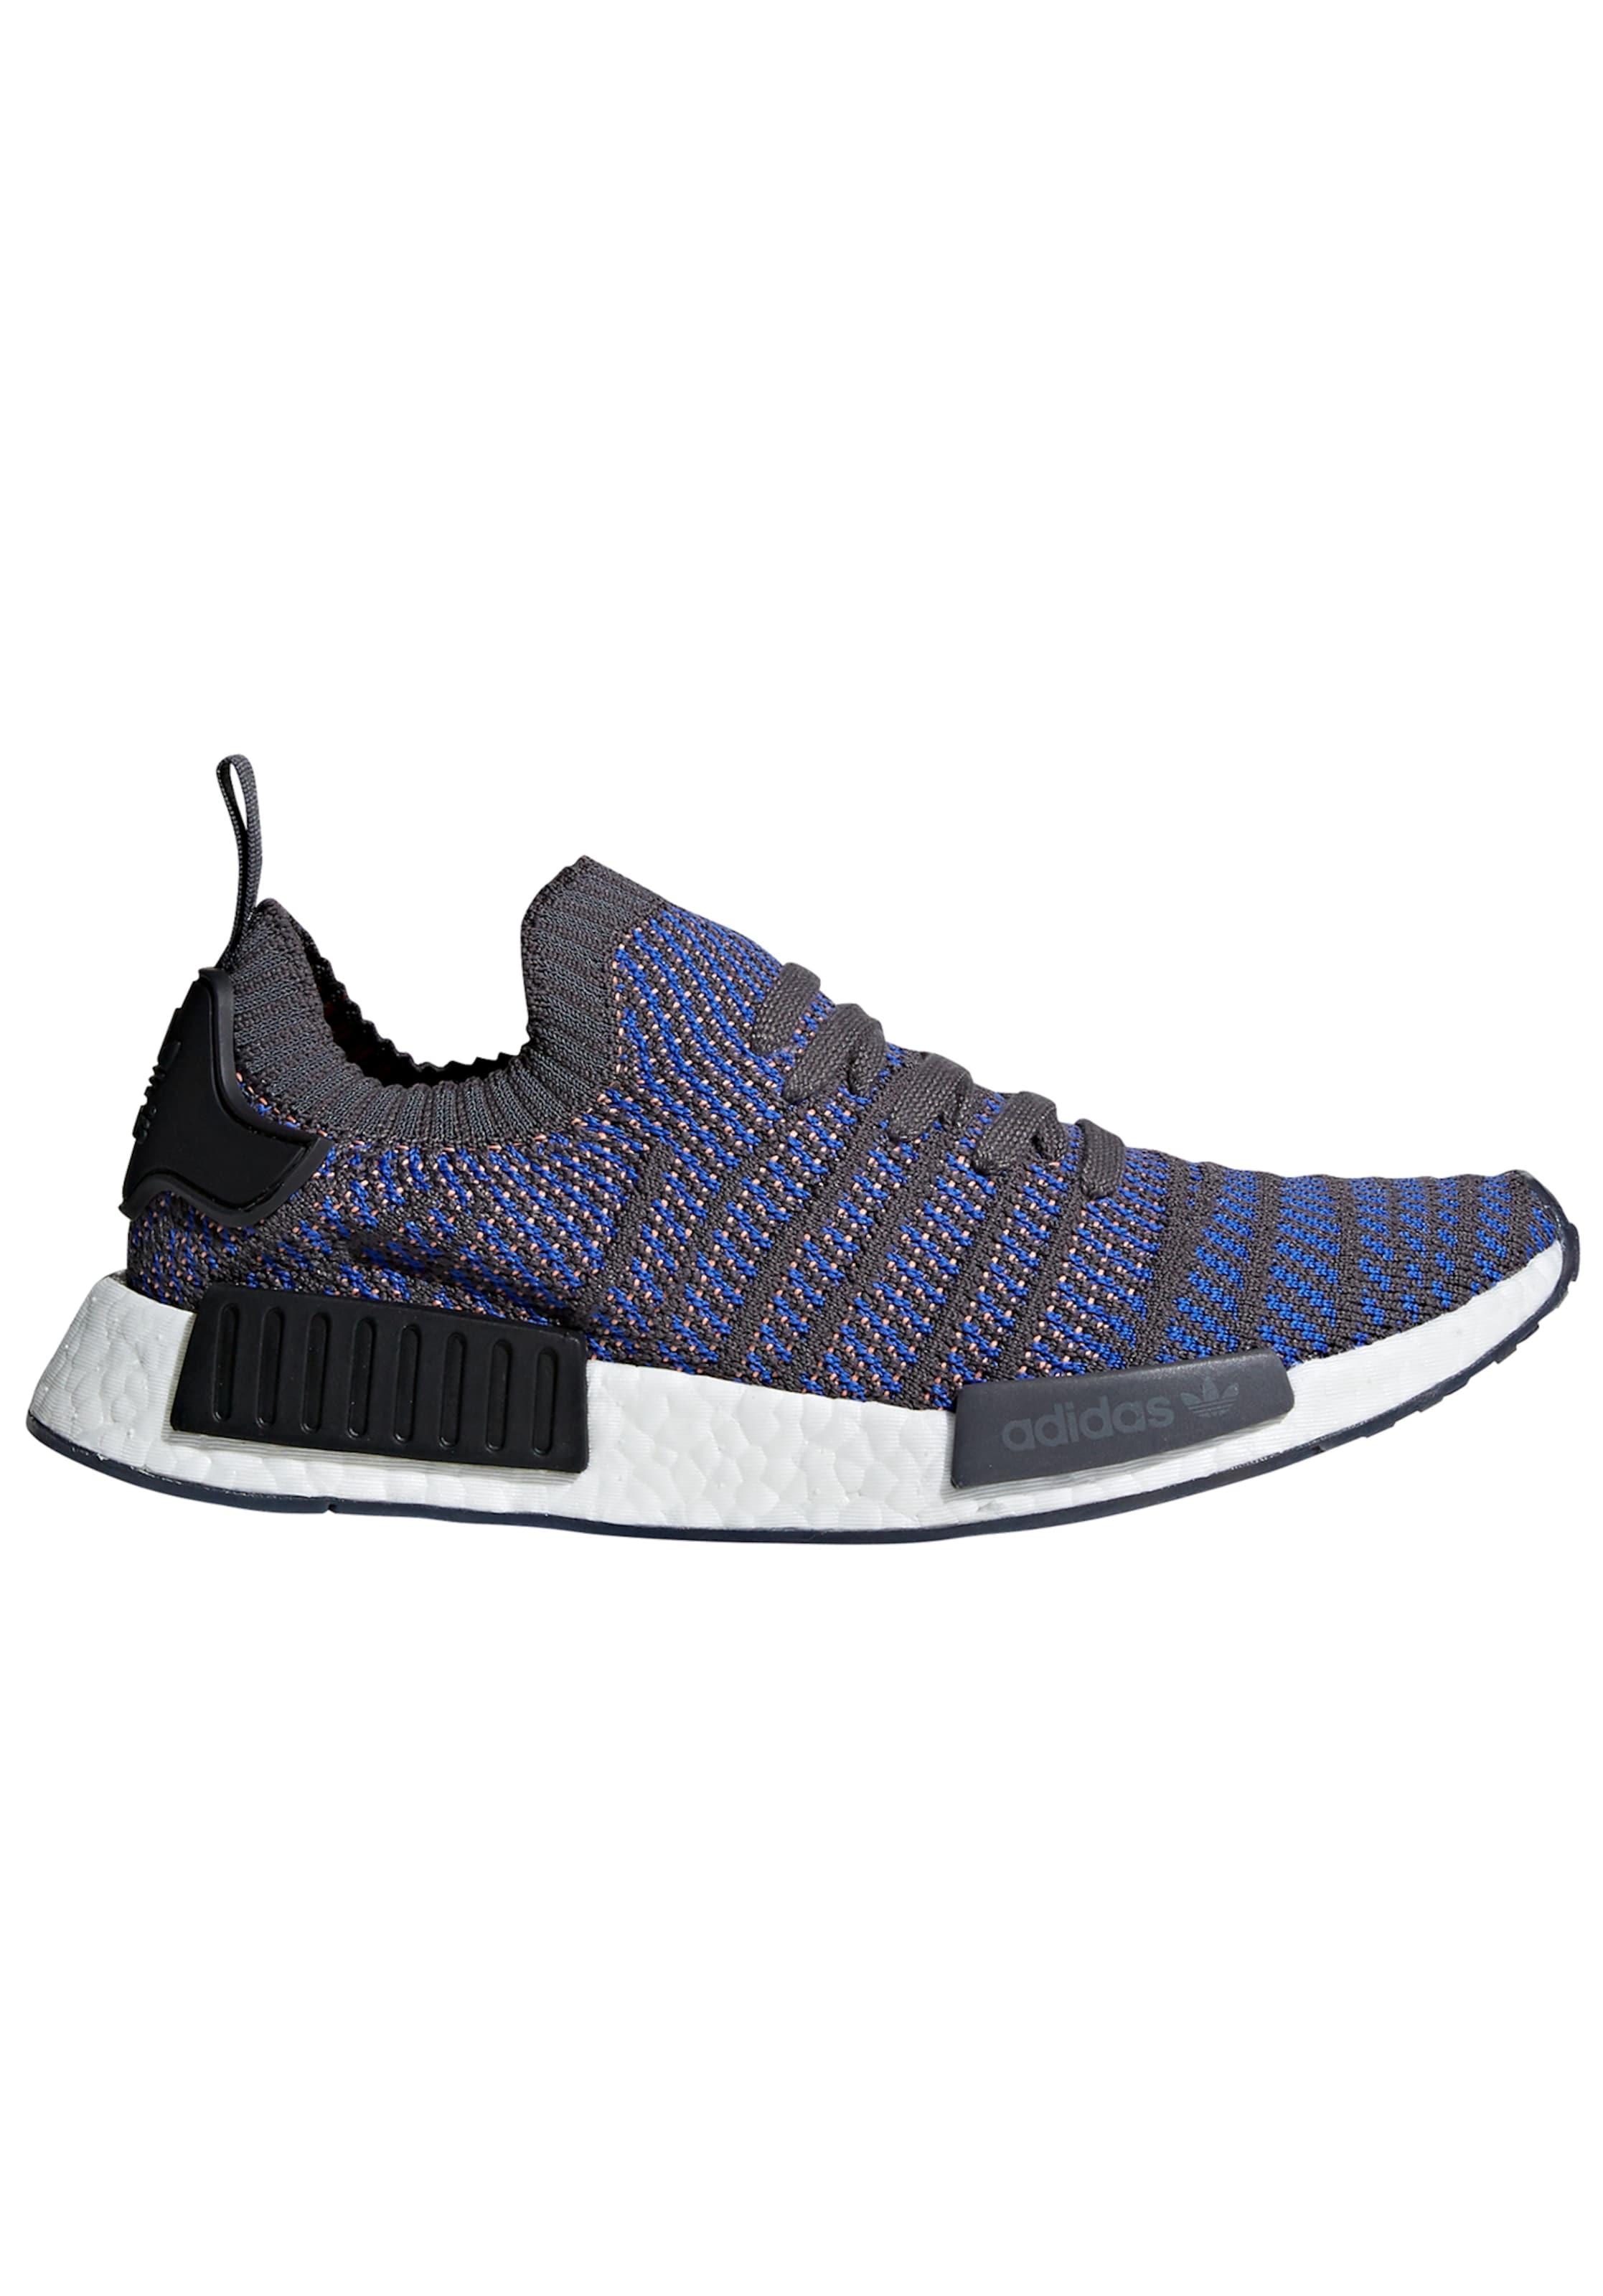 ADIDAS ORIGINALS Nmd_R1 Stlt Pk Sneaker